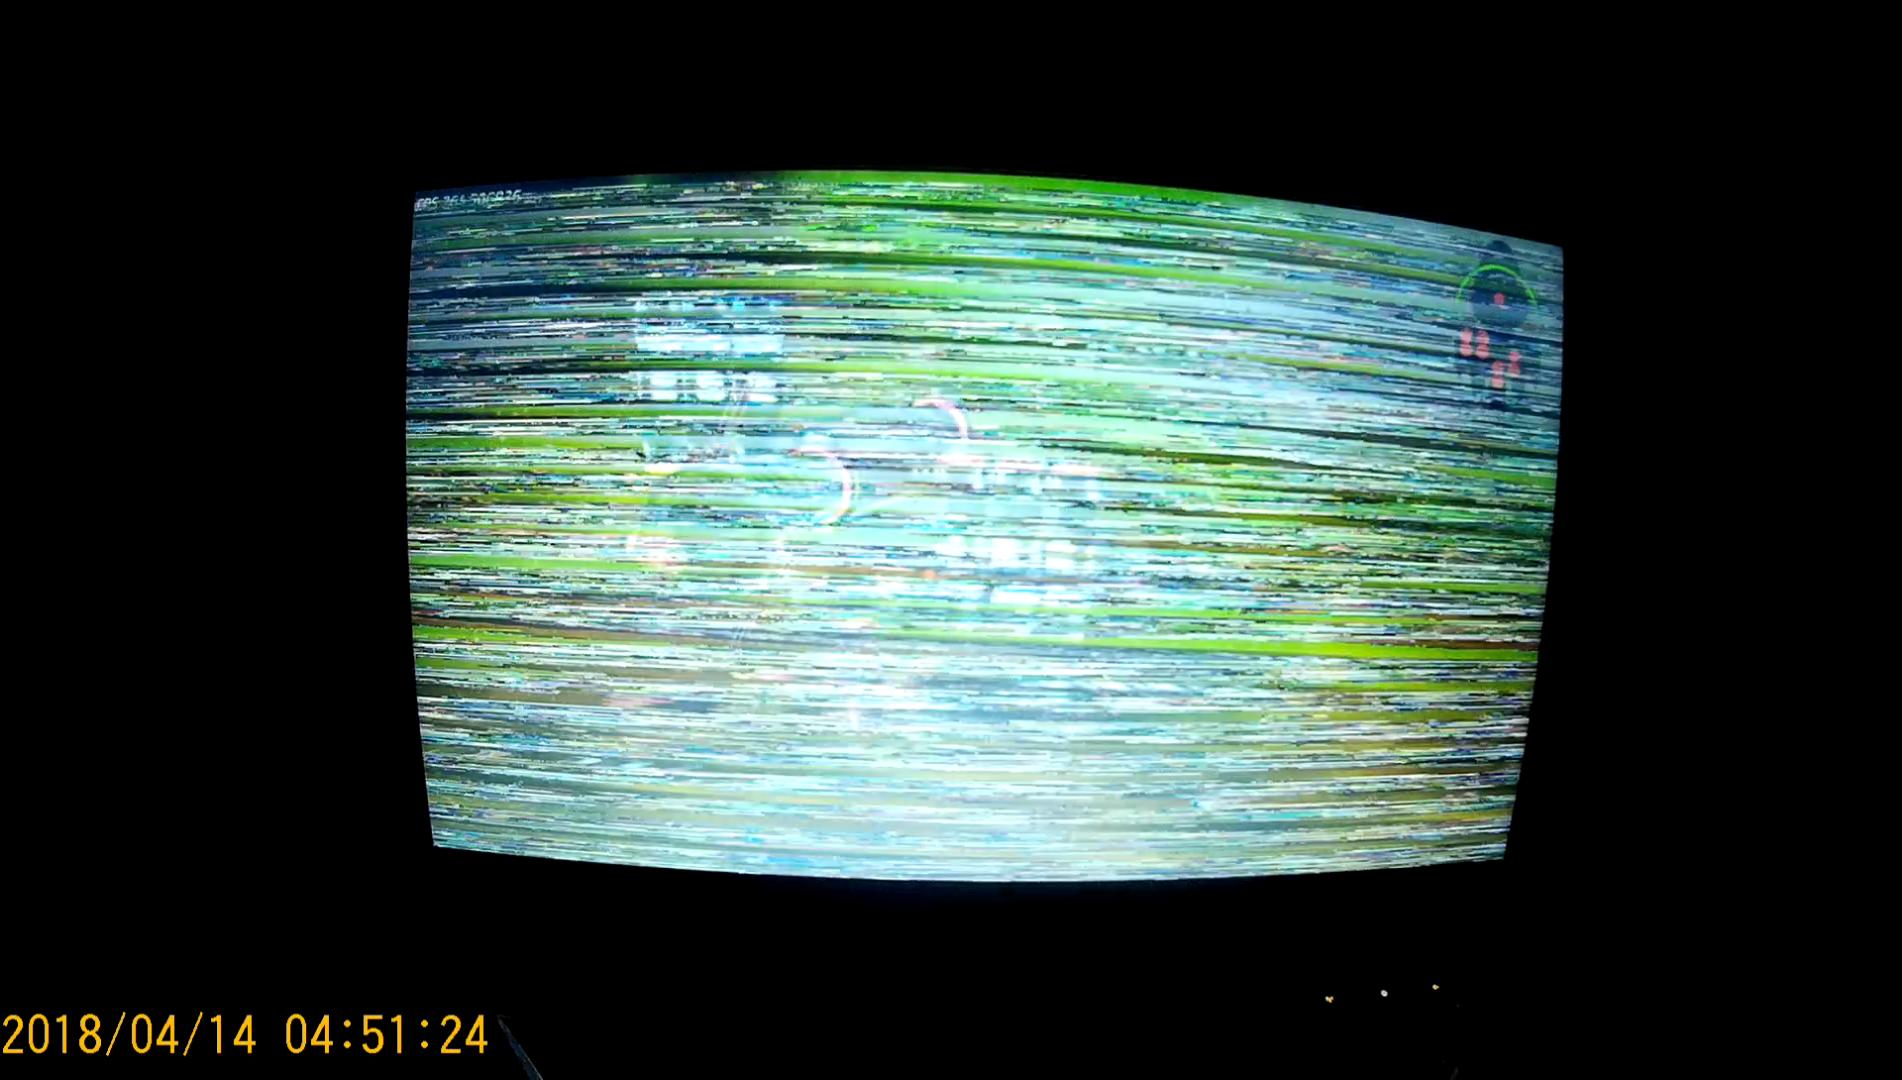 vlcsnap-2018-04-14-19h31m35s912.png